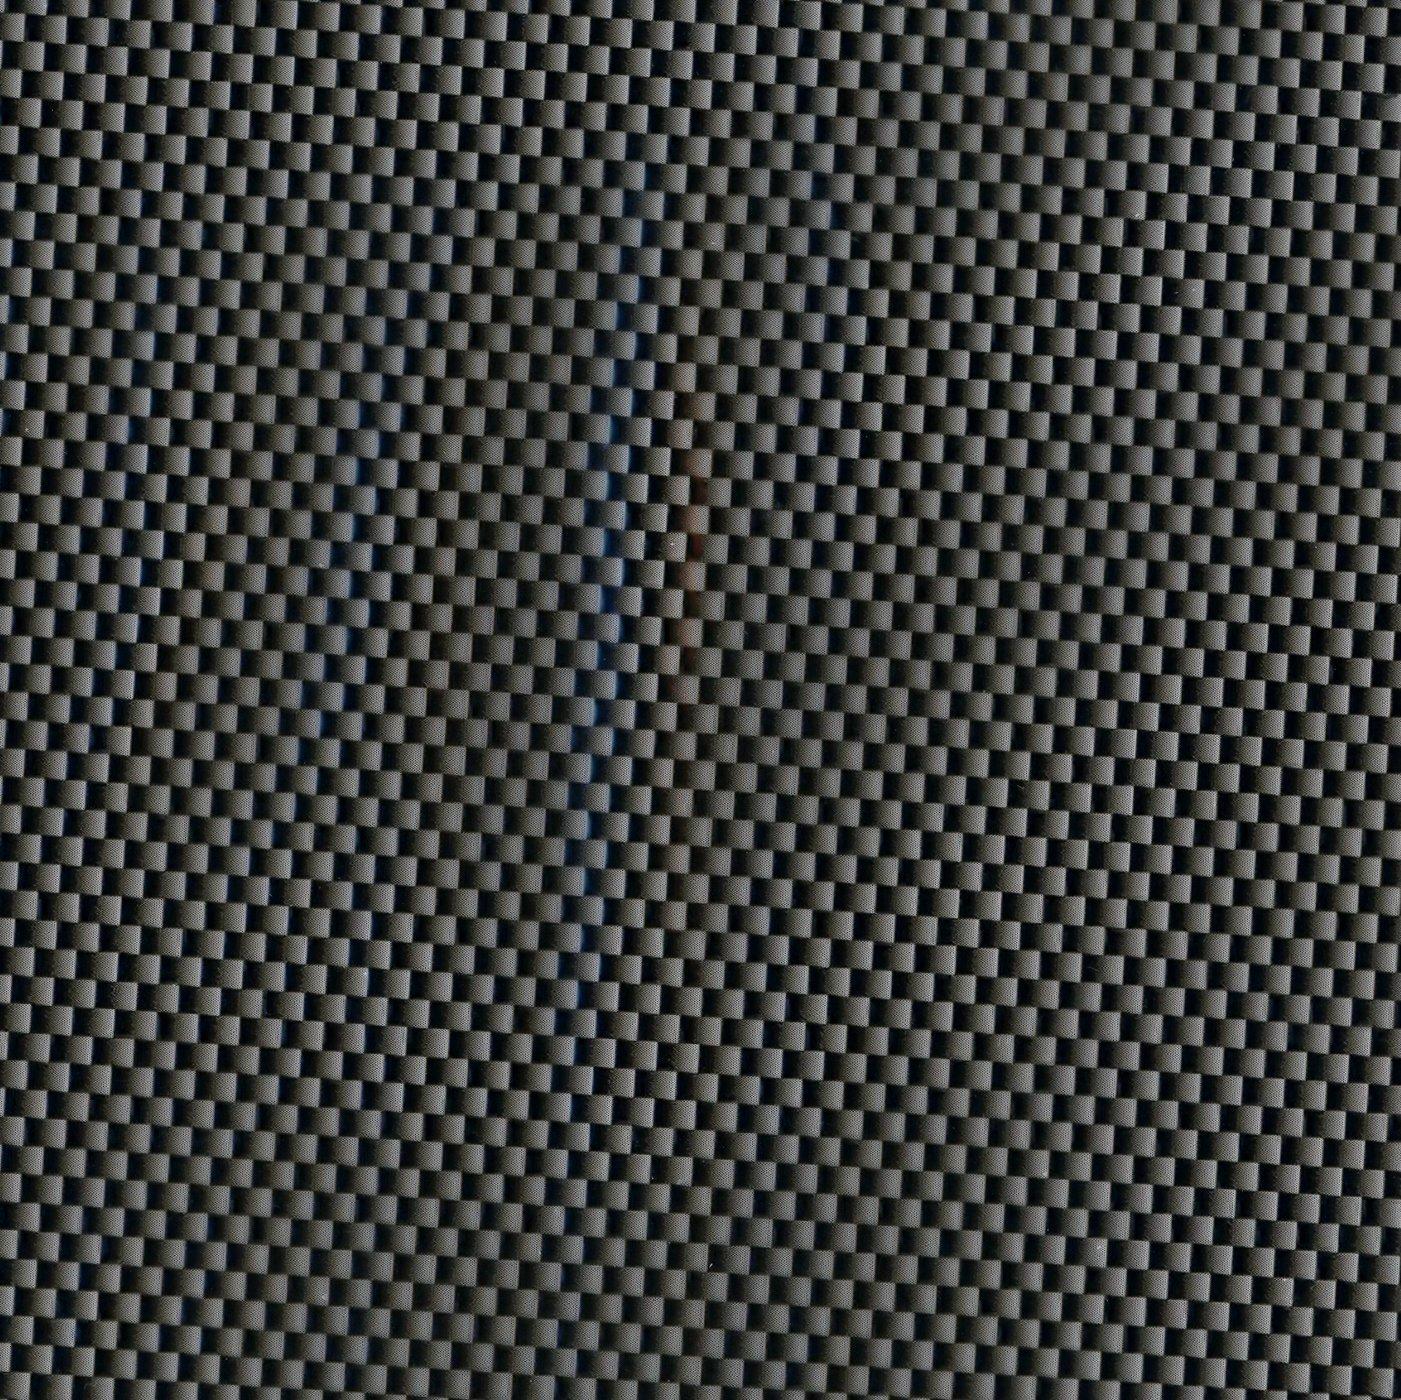 Amazon black clear carbon fiber hydrographics kit mydipkit amazon black clear carbon fiber hydrographics kit mydipkit cf 152 my dip kit solutioingenieria Choice Image